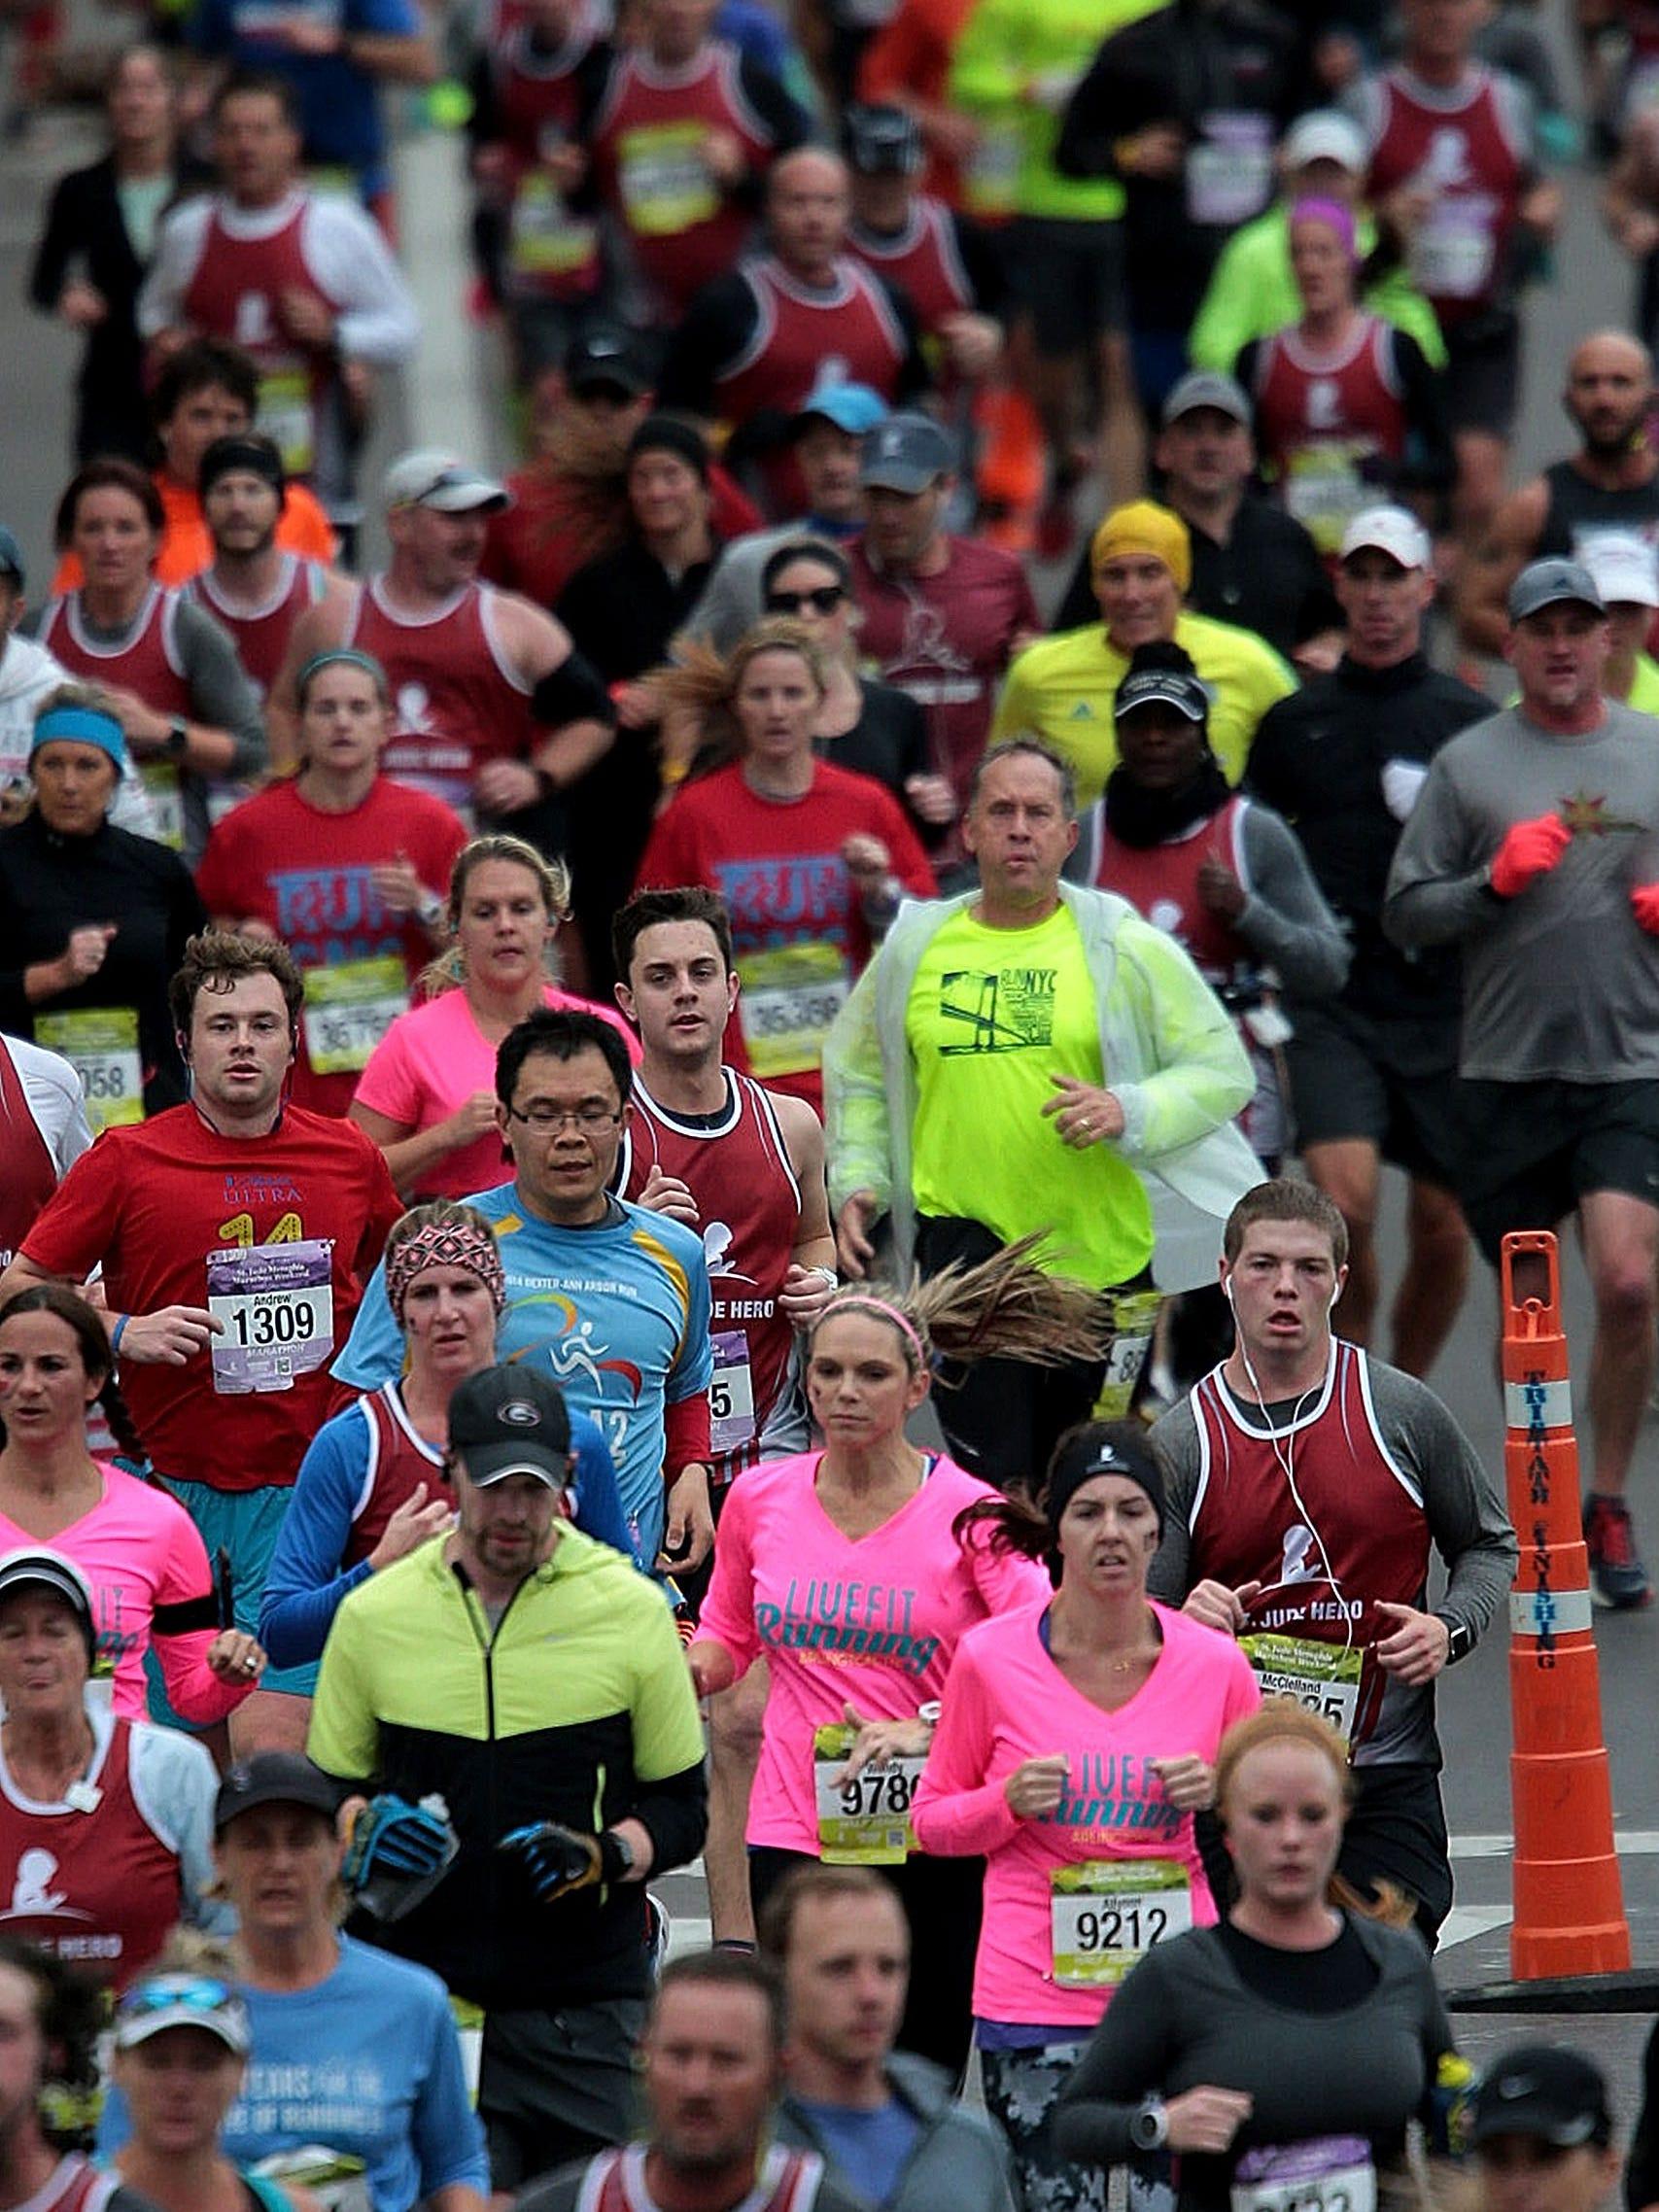 Complete St Jude Memphis Half Marathon Results